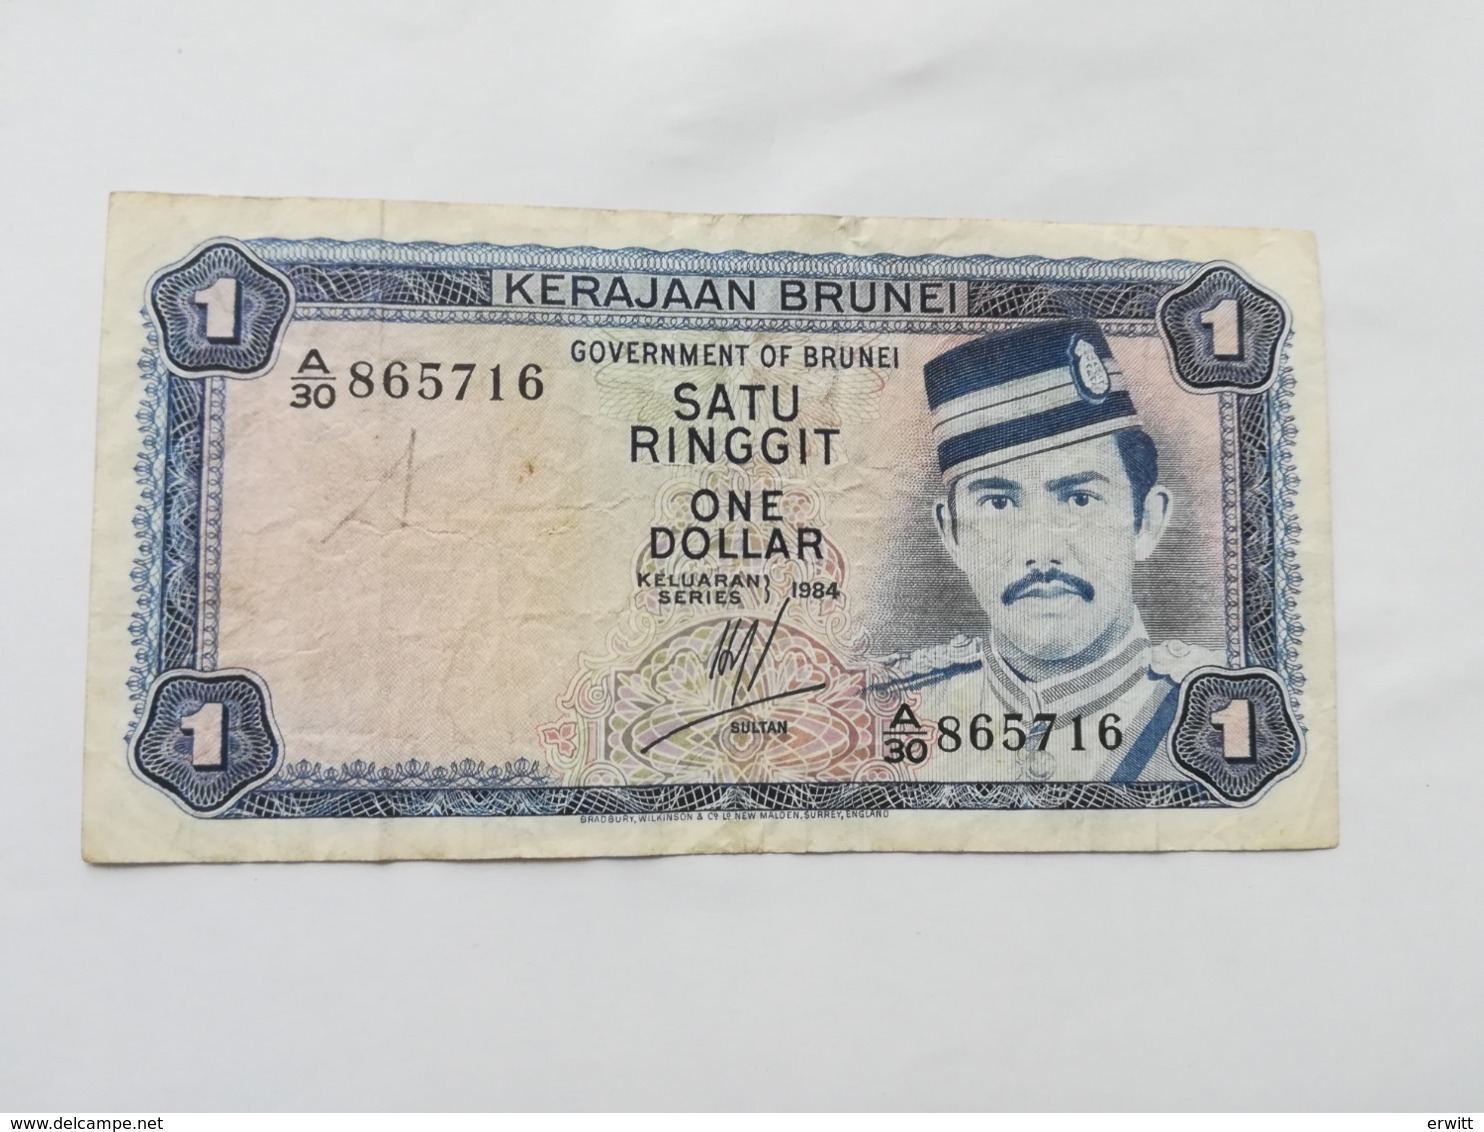 BRUNEI 1 RINGGIT 1984 - Brunei